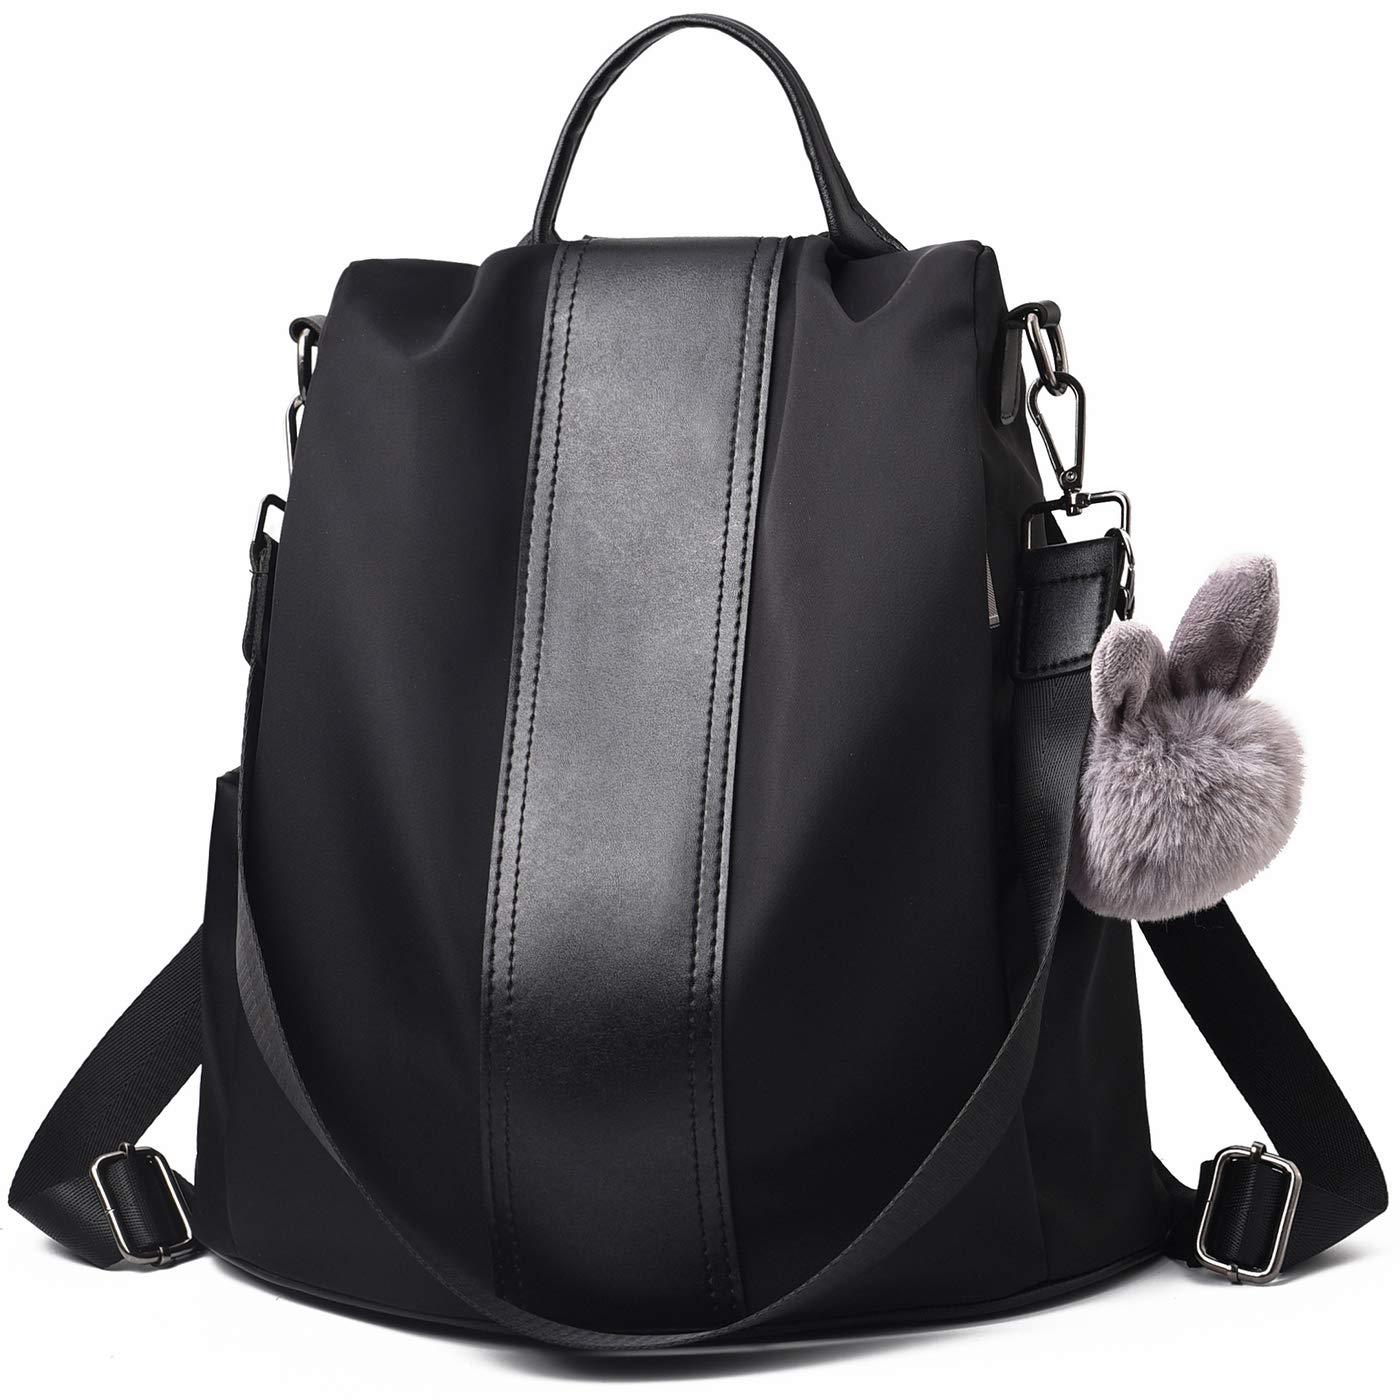 Charmore Women Backpack Ladies Rucksack Waterproof Nylon School bags  Anti-theft Dayback Shoulder Bags (Black2)  Amazon.co.uk  Shoes   Bags b04fcf86a